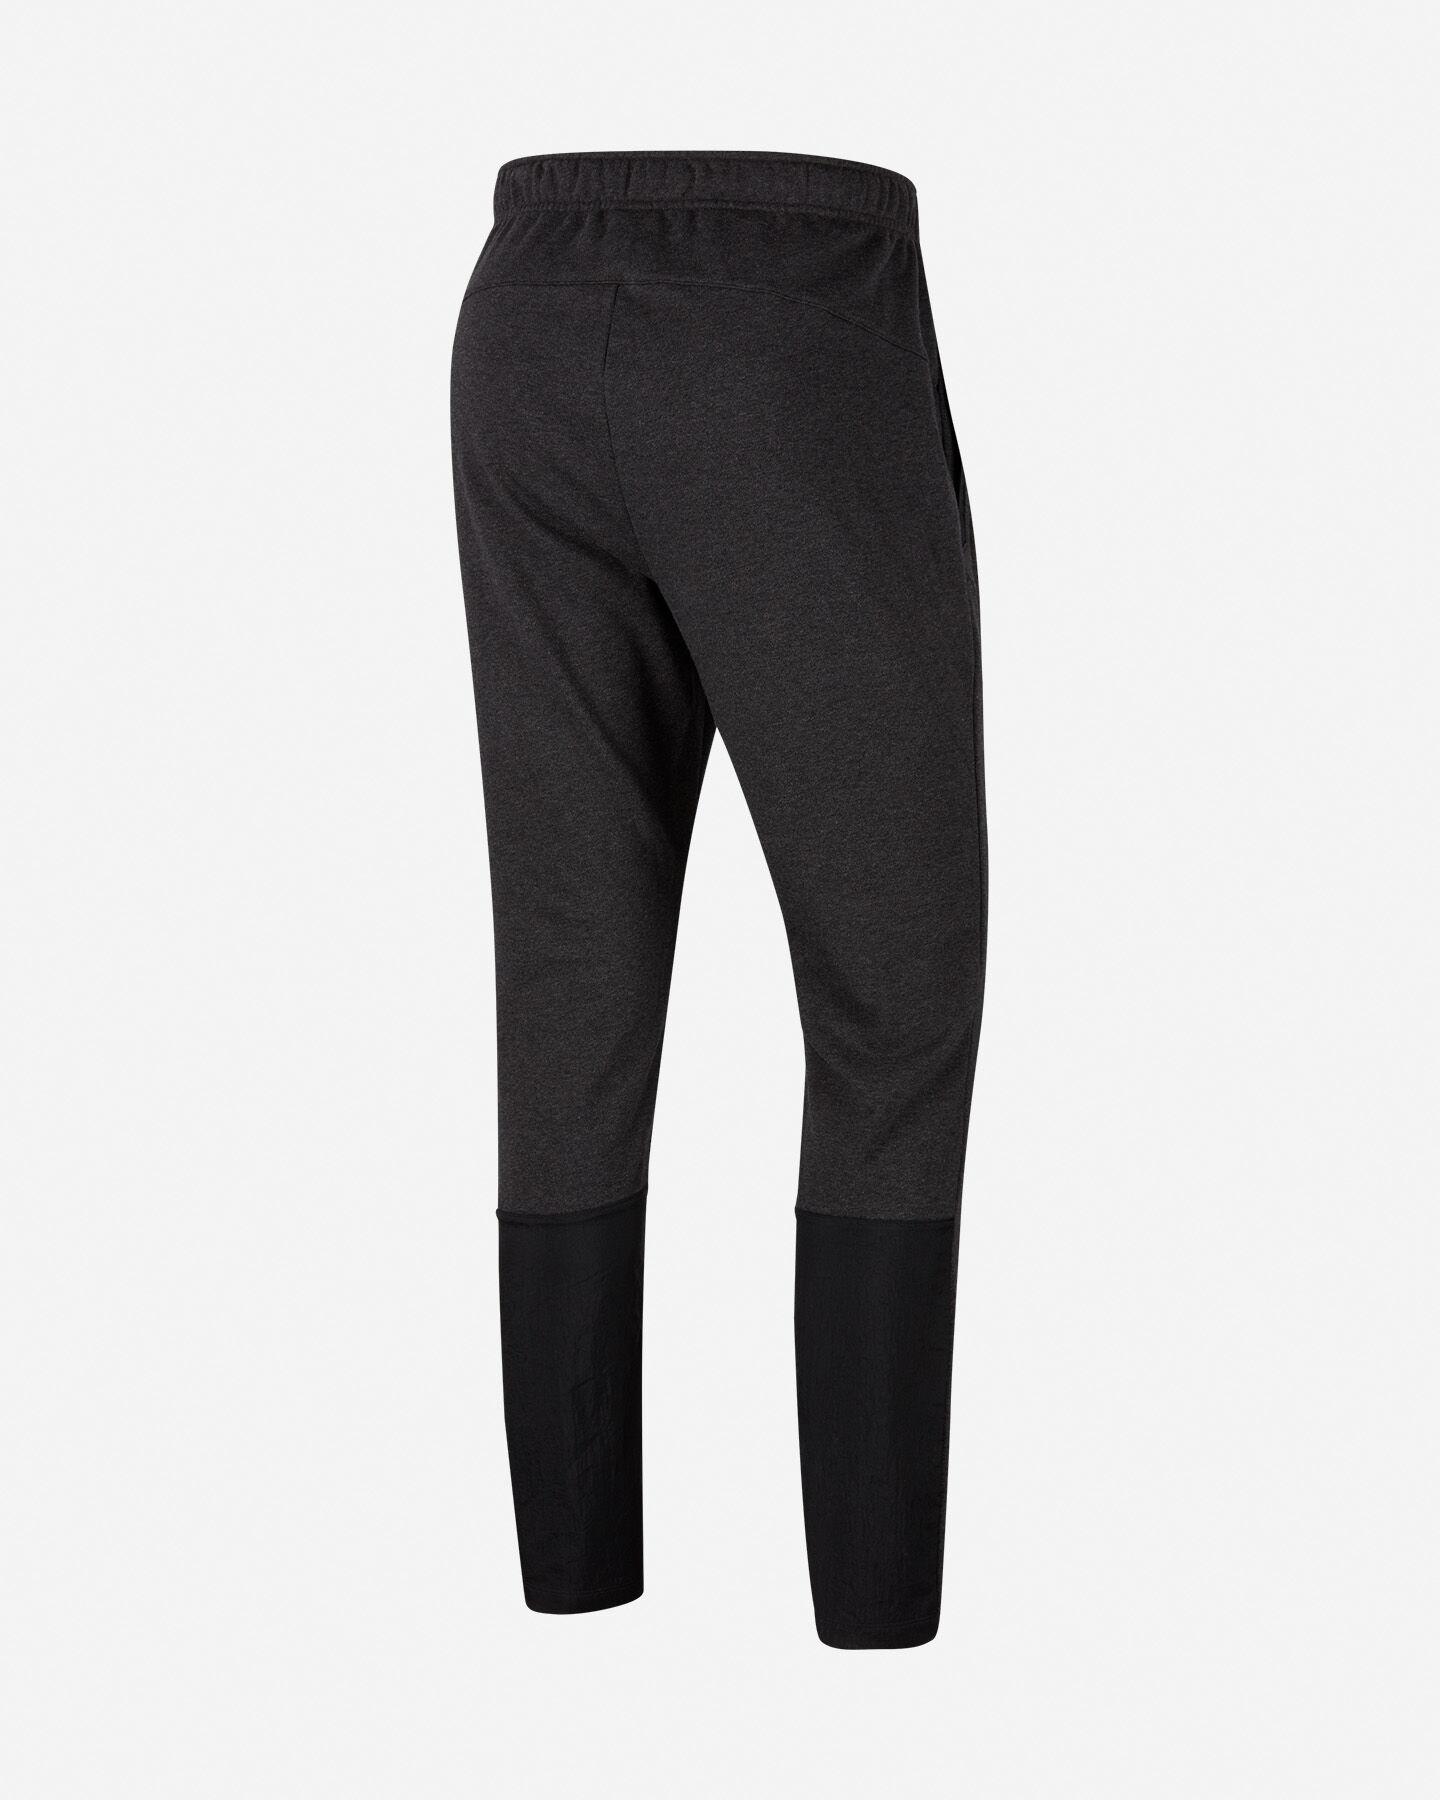 Pantalone training NIKE DRI-FIT M S5225654 scatto 1